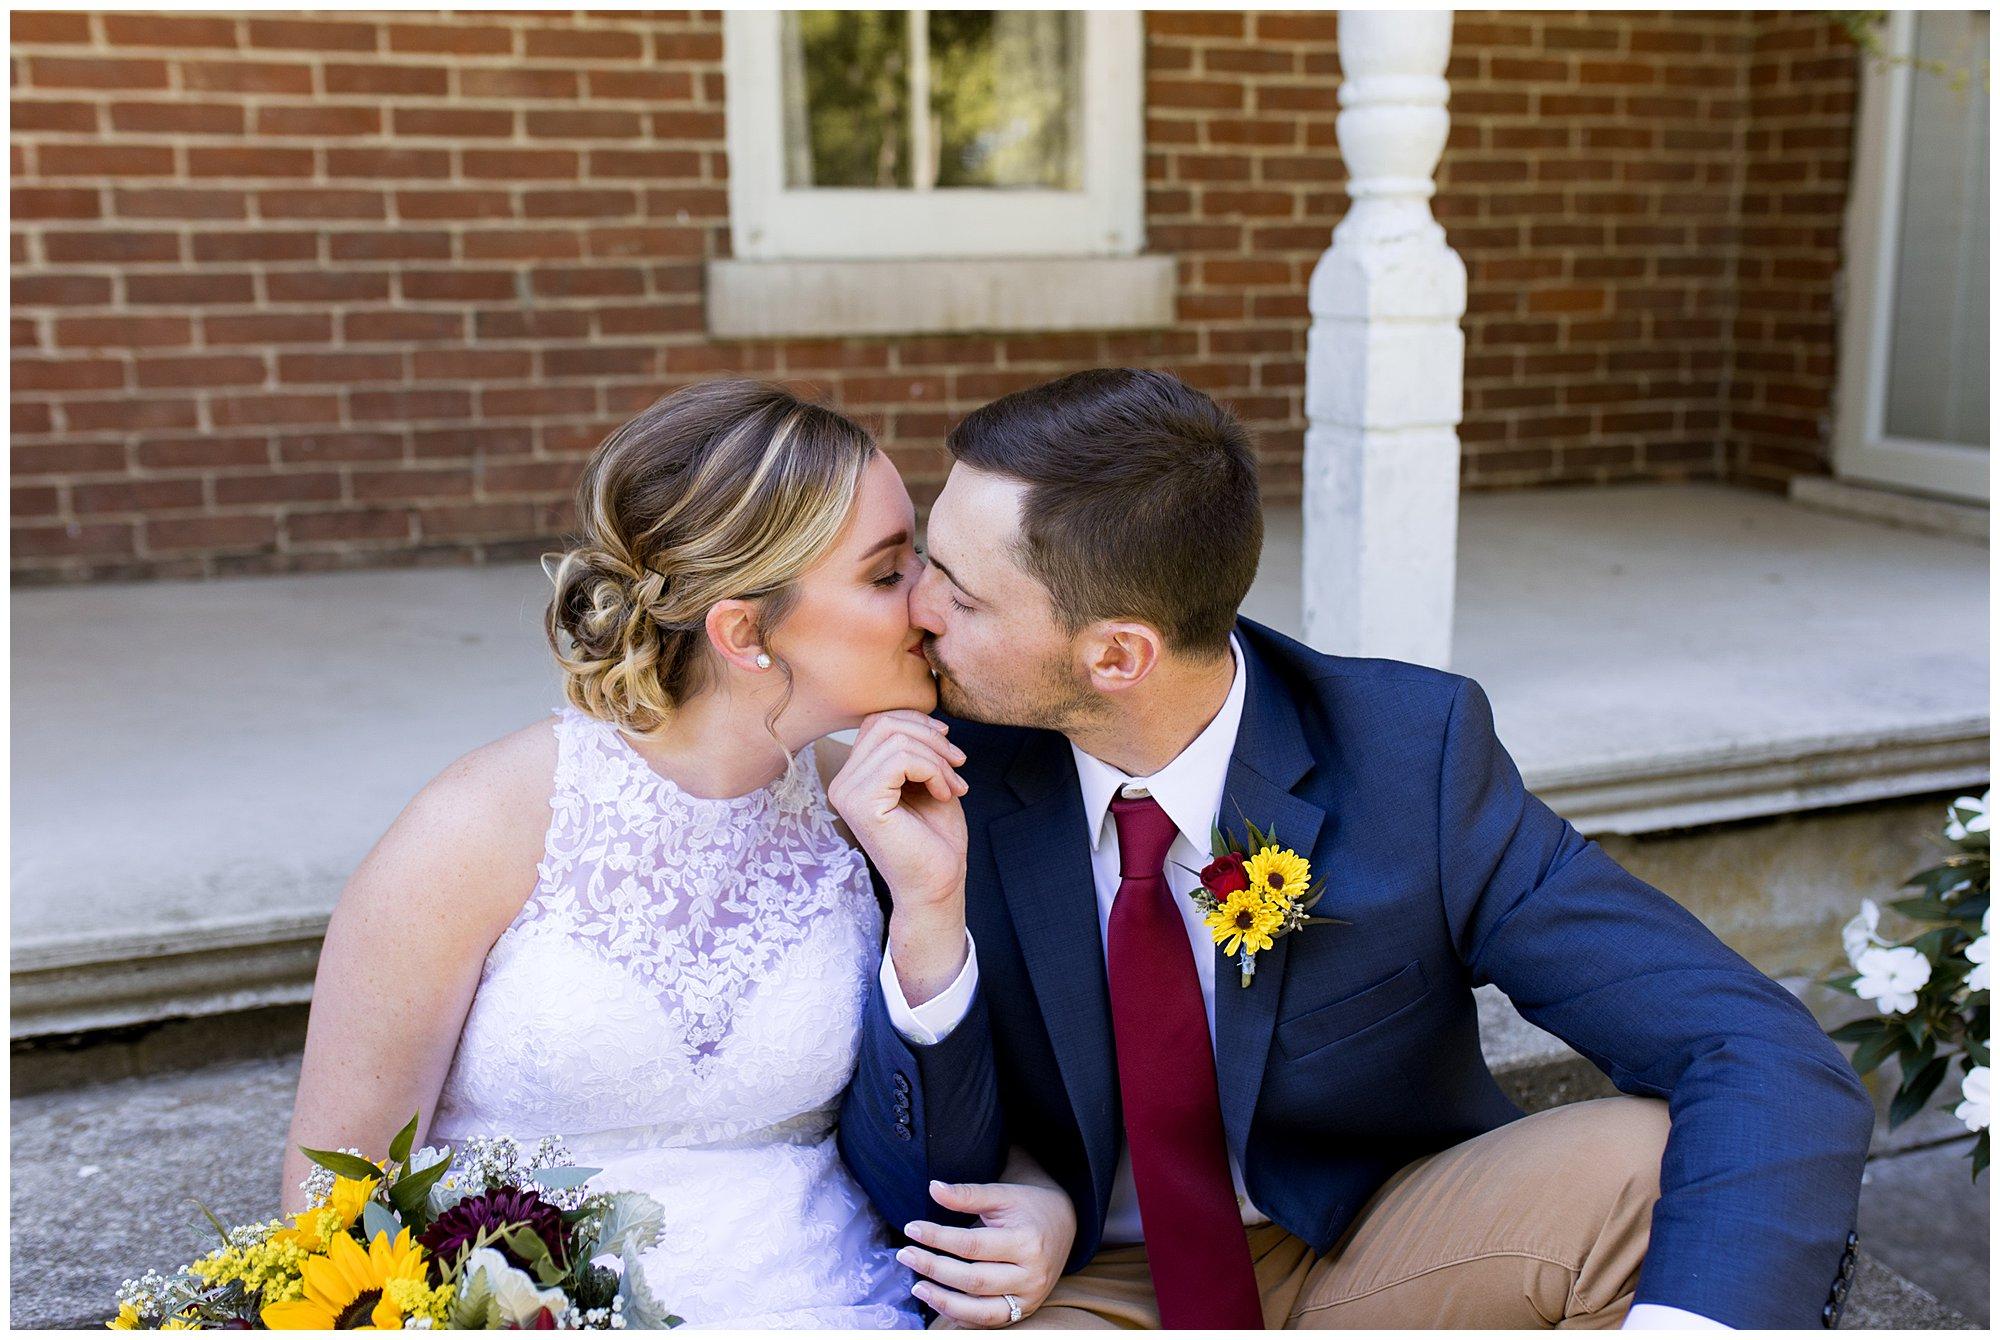 bride and groom kiss at Legacy Barn wedding venue in Kokomo Indiana